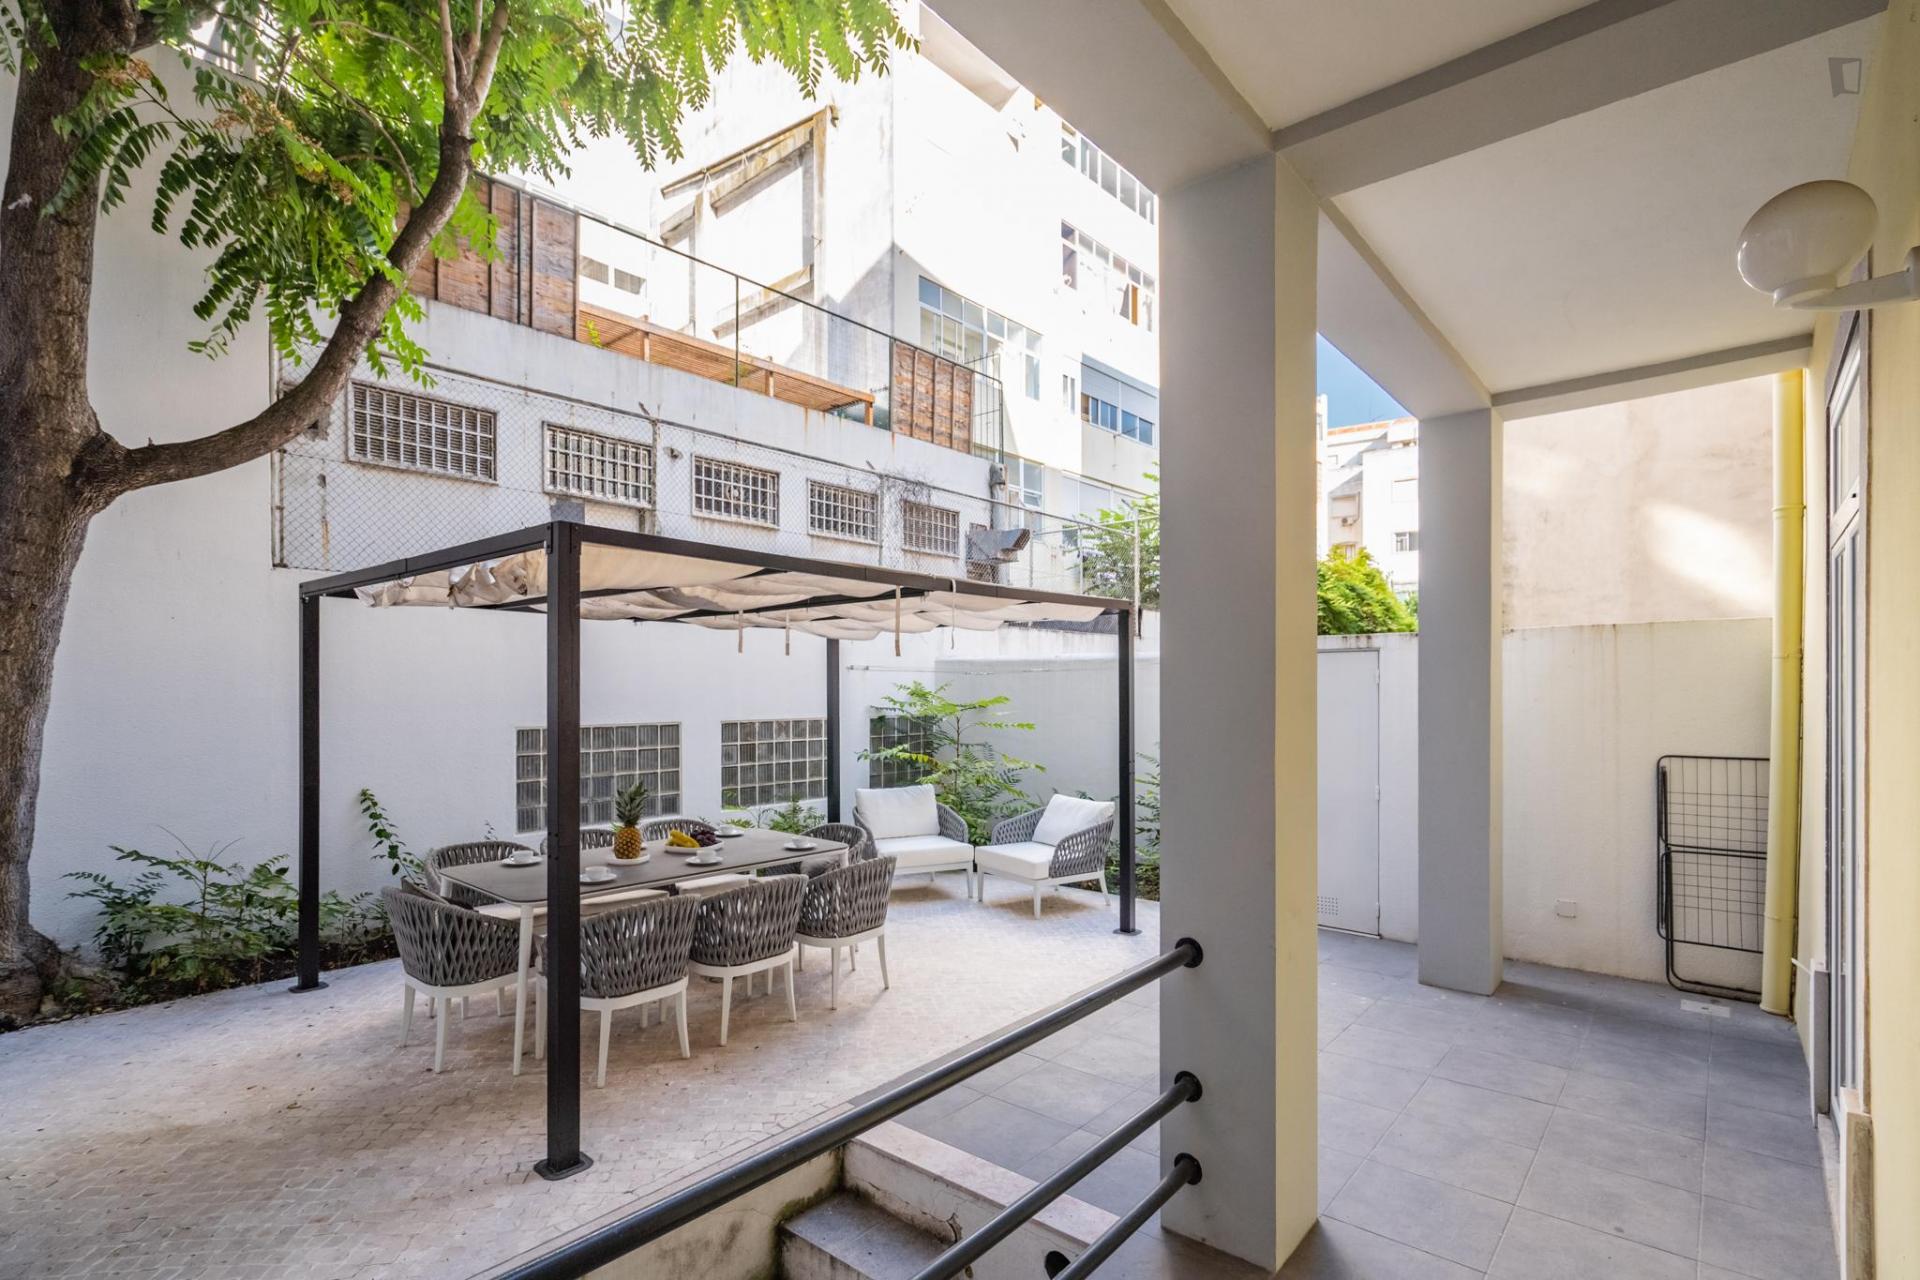 Farmacêutica- Piso de lujo de 4 cuartos en Lisboa